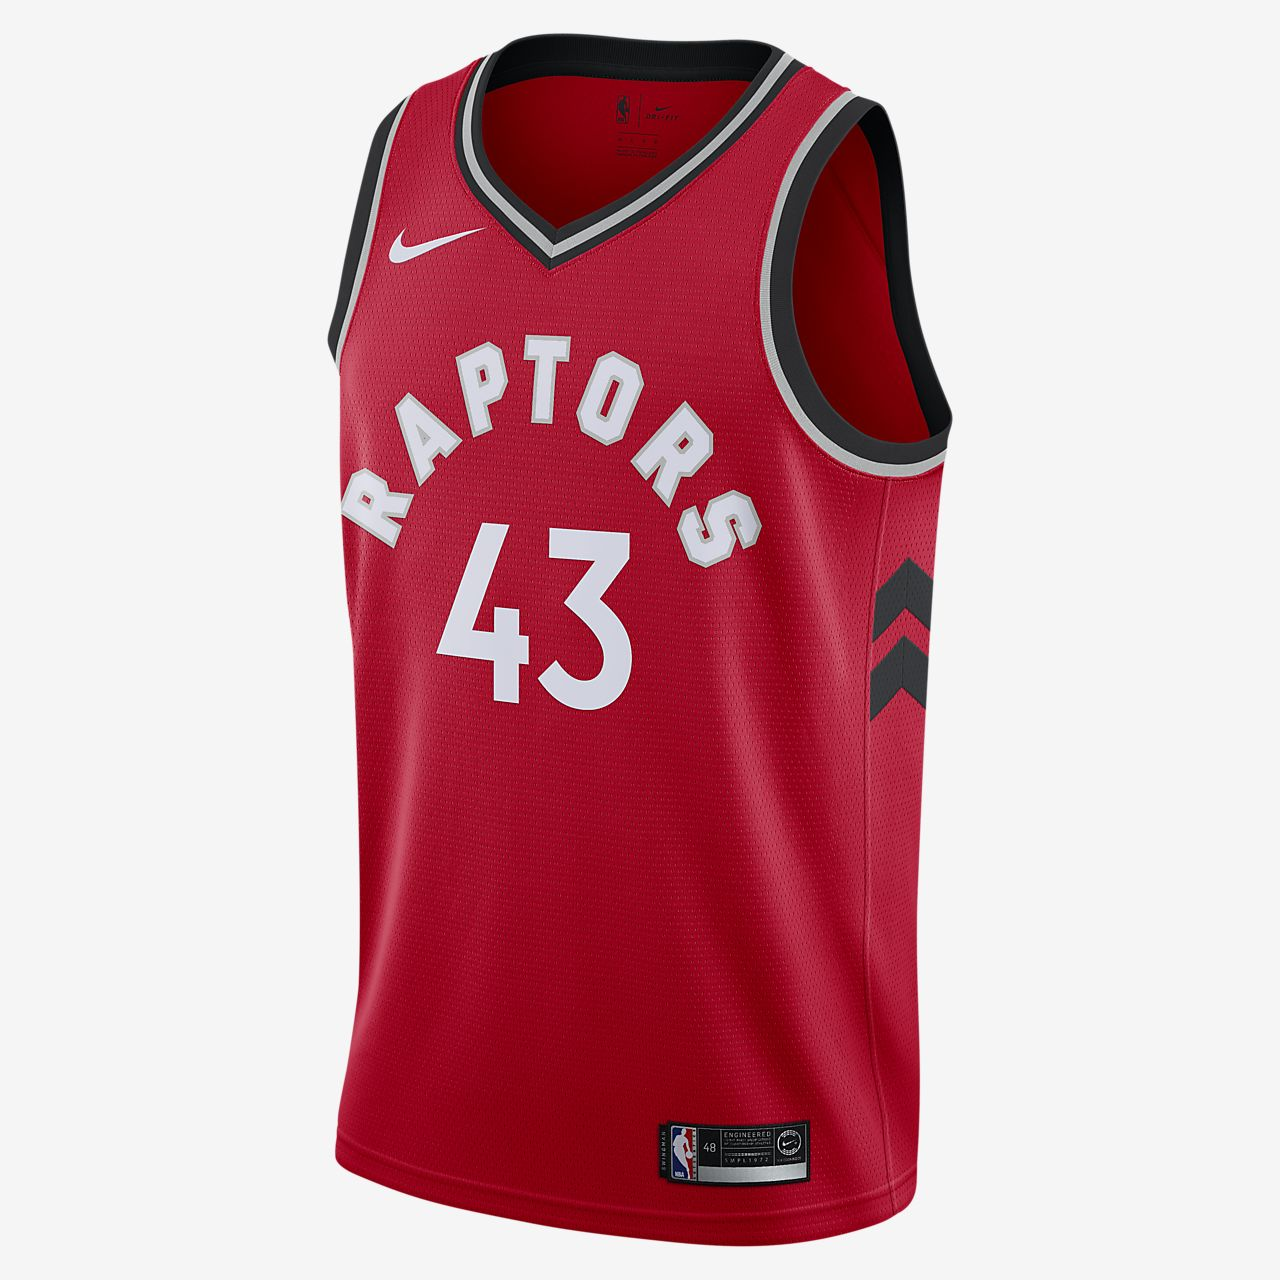 Camiseta Nike NBA Swingman Pascal Siakam Raptors Icon Edition